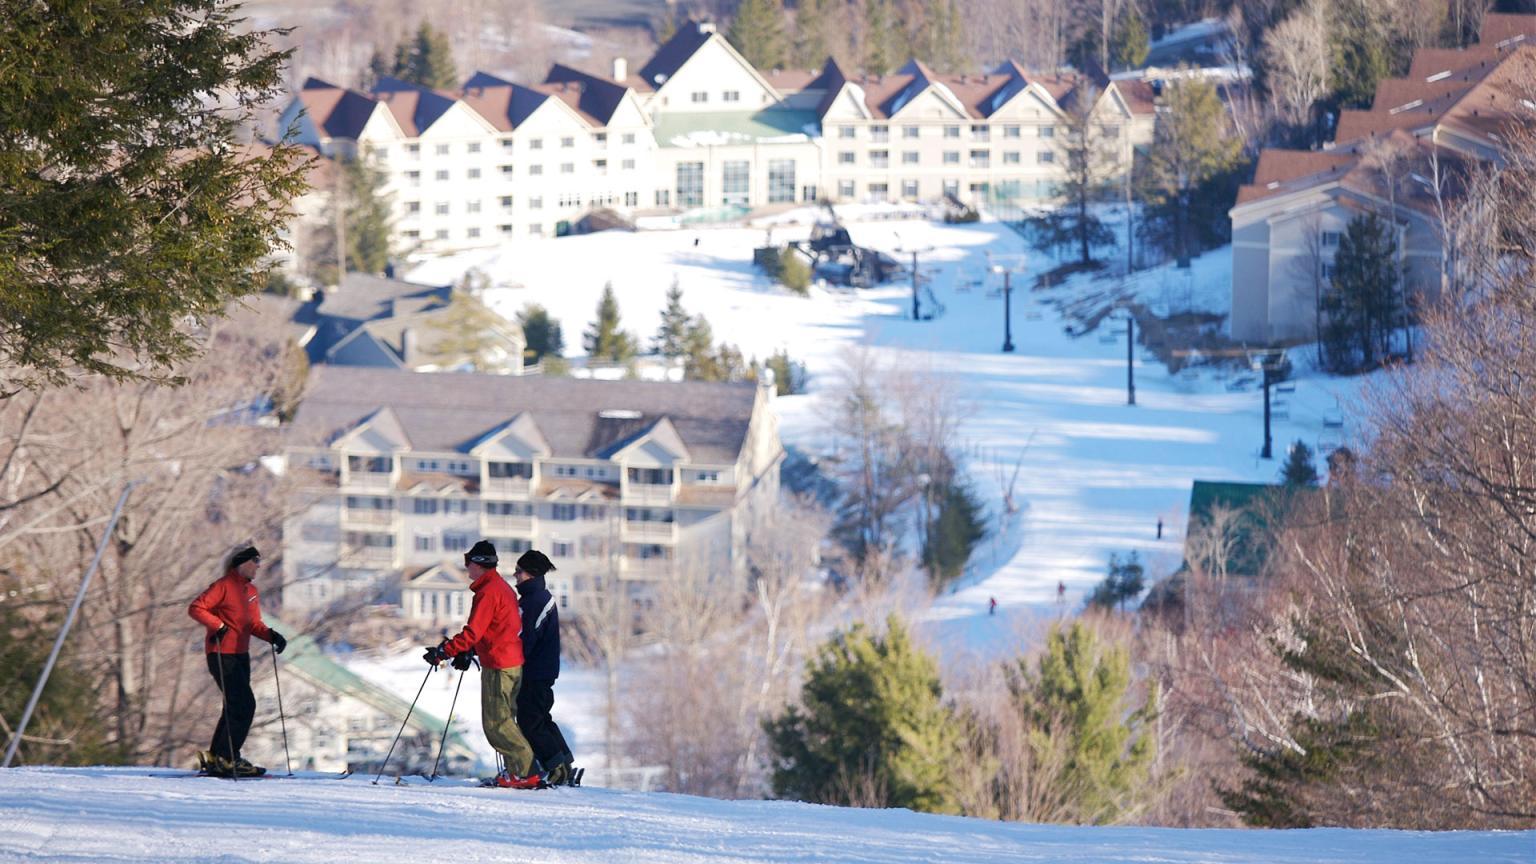 ski resort opening dates 2018/2019 | new england inns and resorts